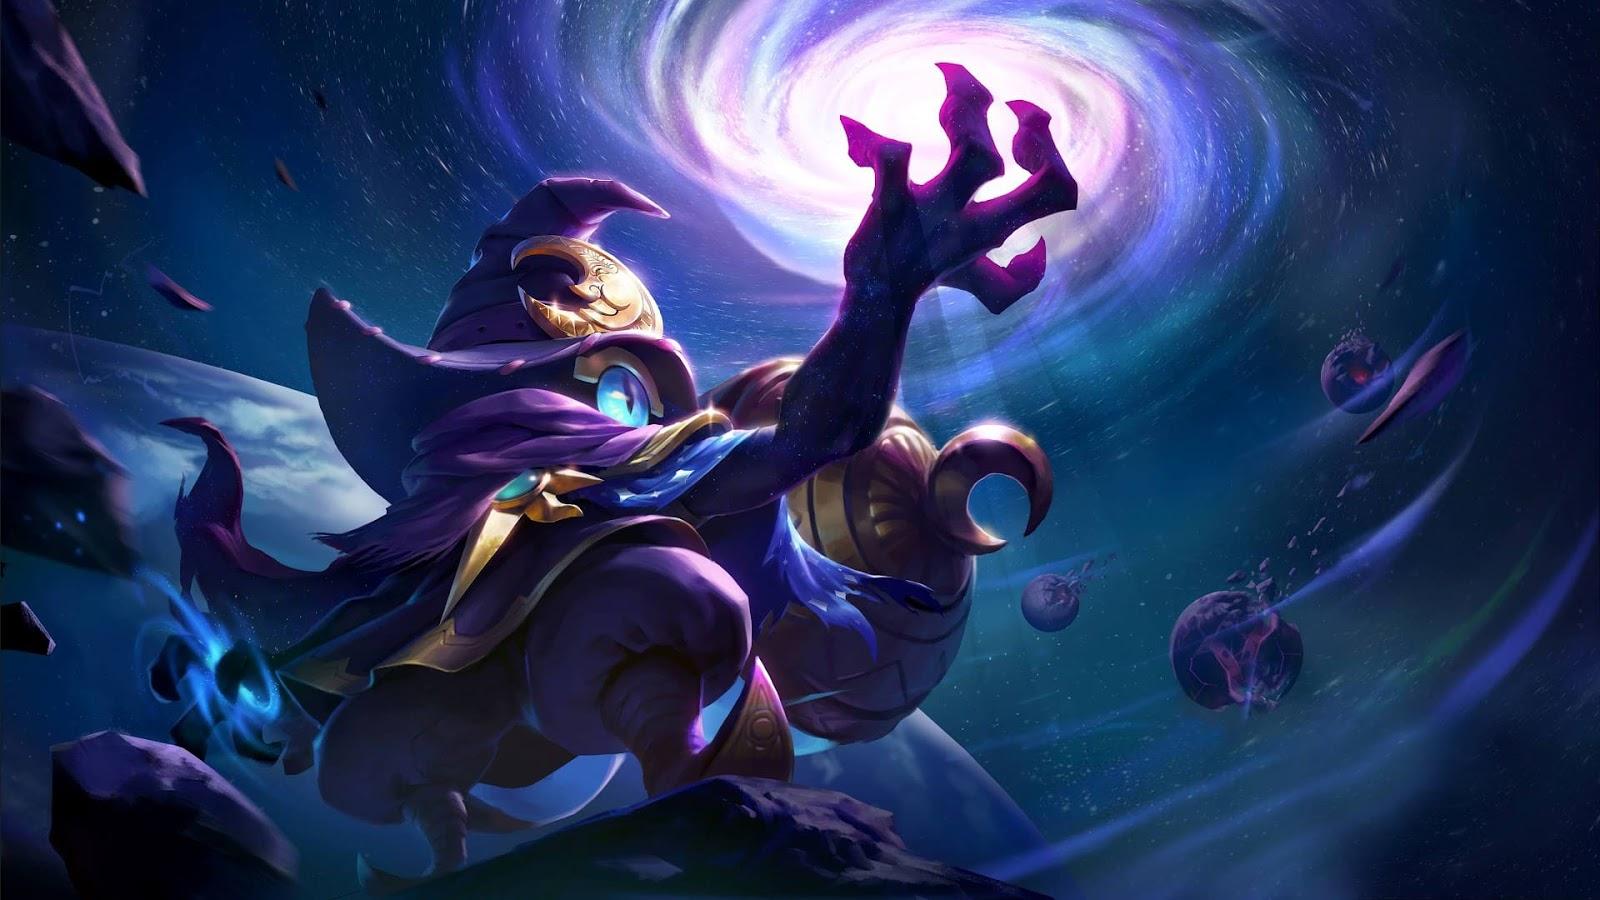 Wallpaper Cyclops Starsoul Magician Skin Mobile Legends HD for PC